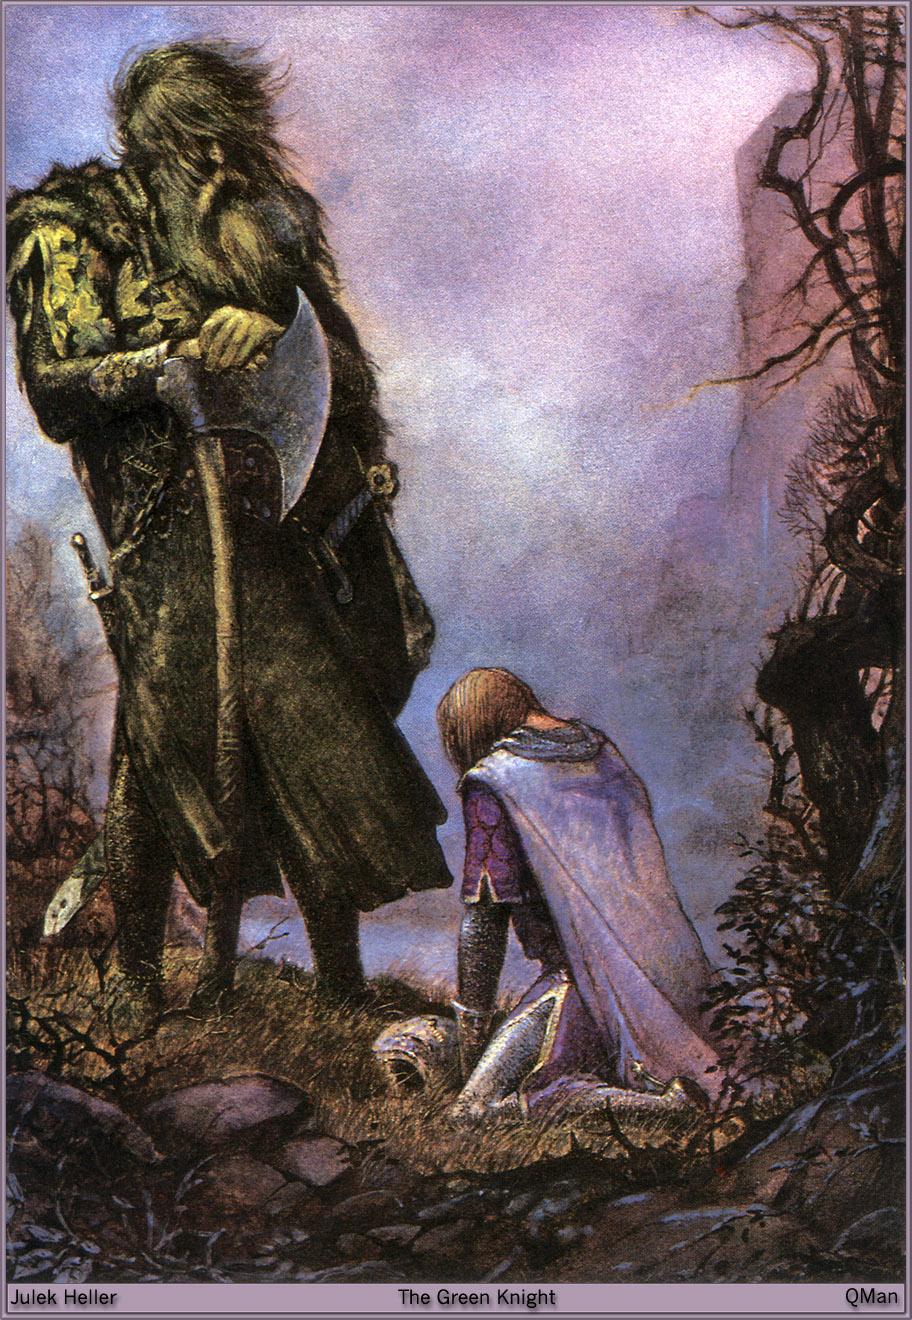 Sir gawain and the green knight symbolism essays